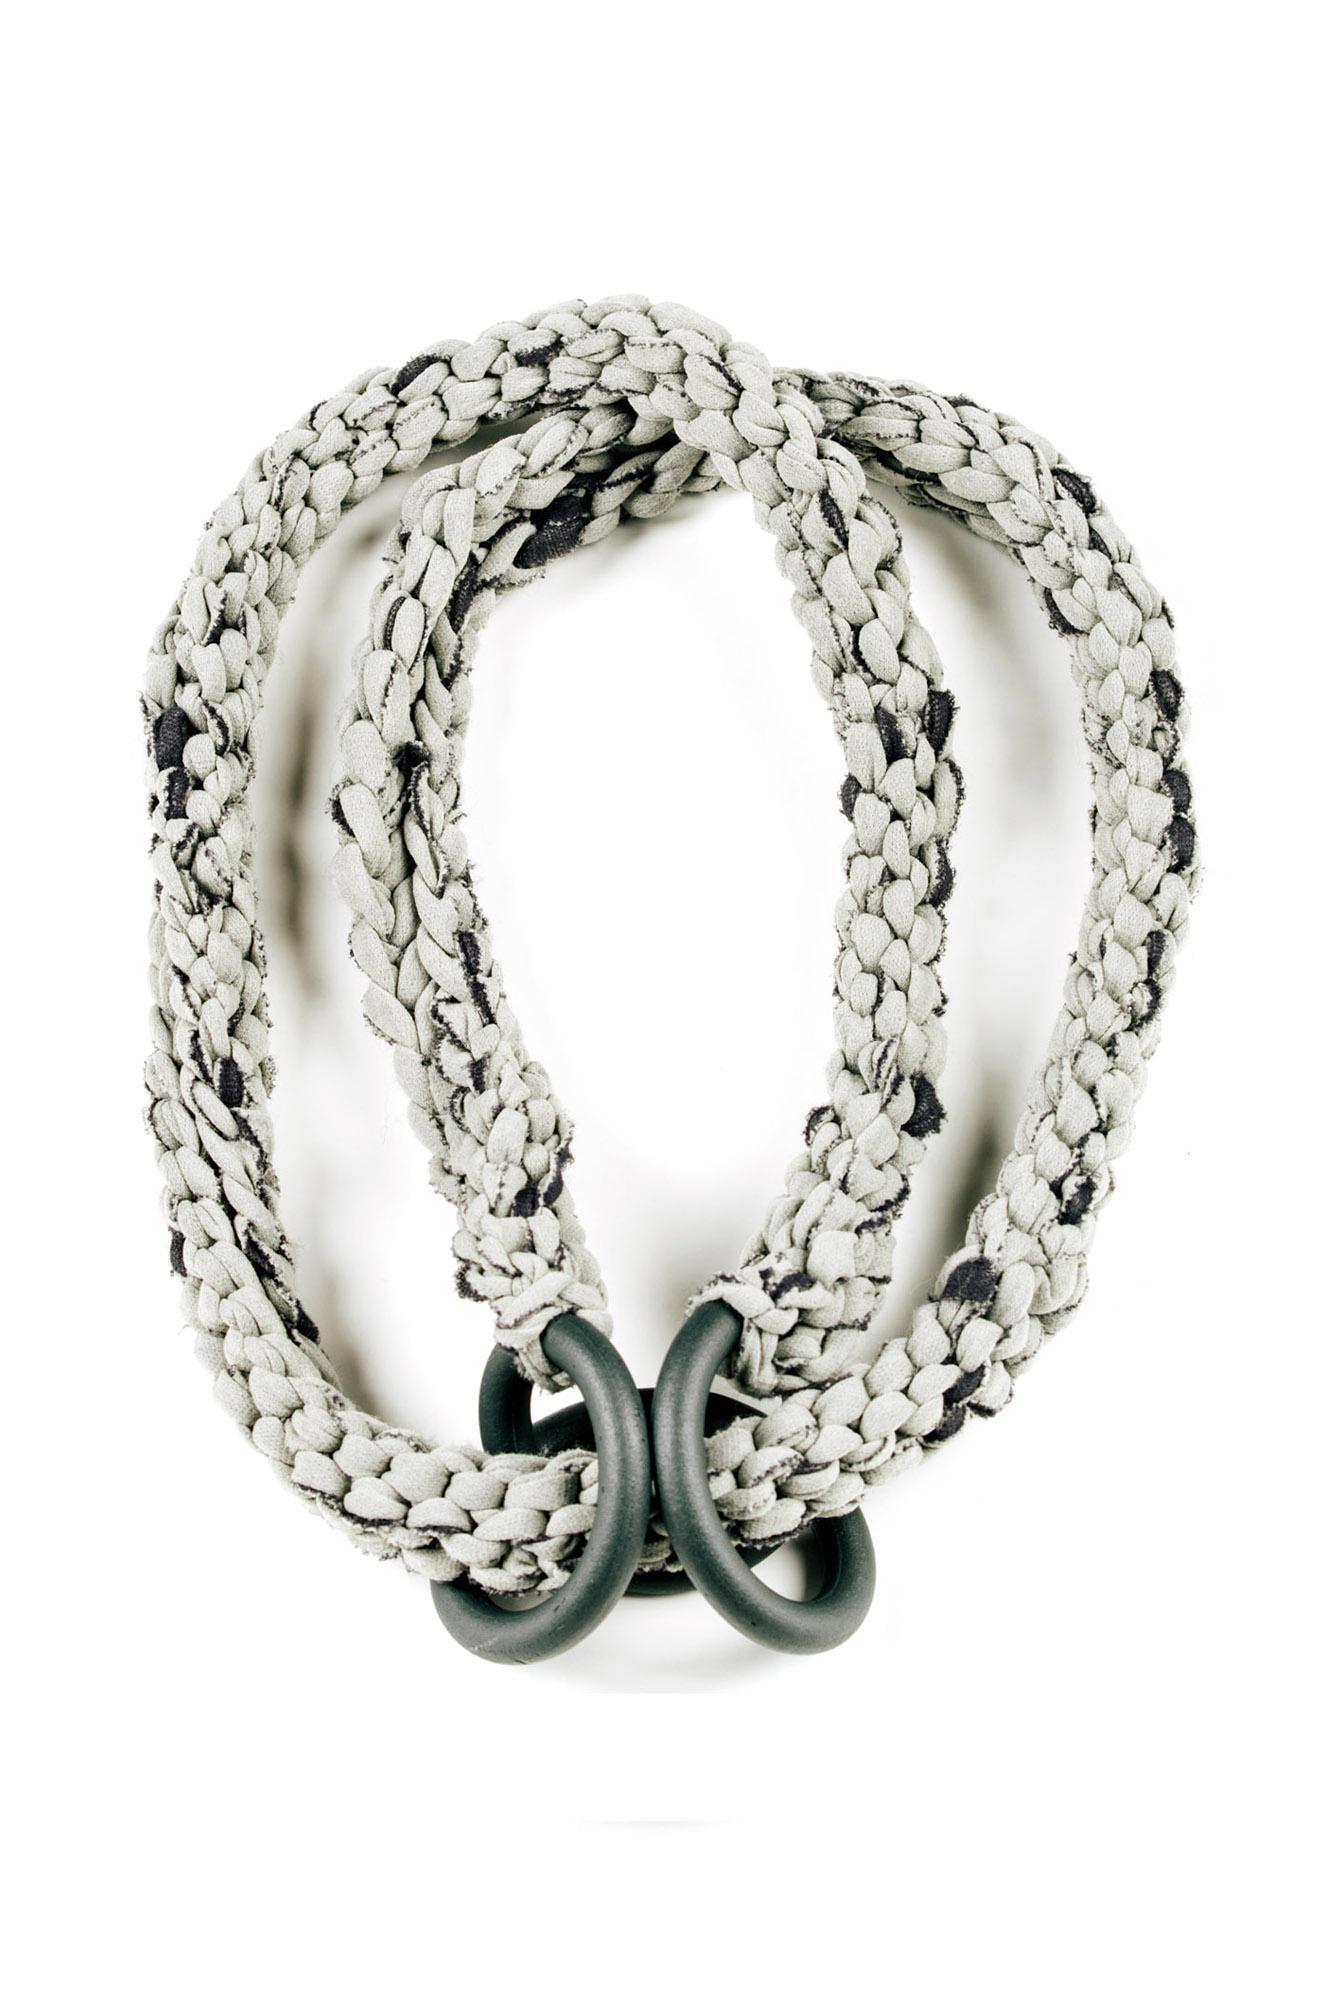 Bocco necklace by Anna Borshi 08.jpg